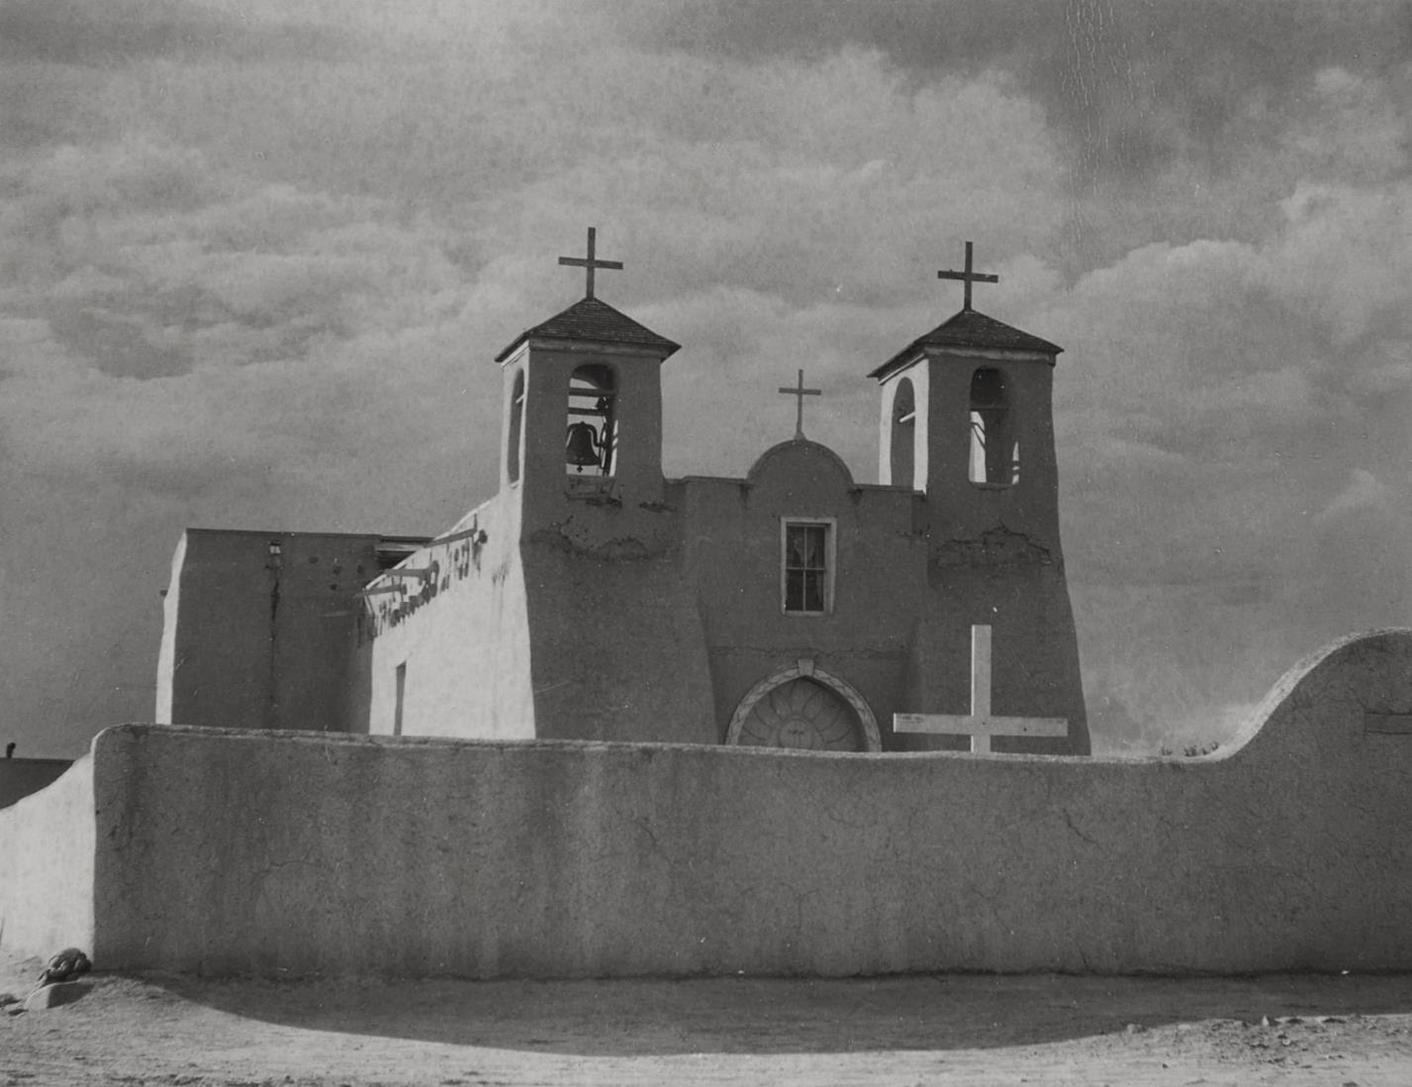 Paul Strand-Ranchos De Taos Church-1931